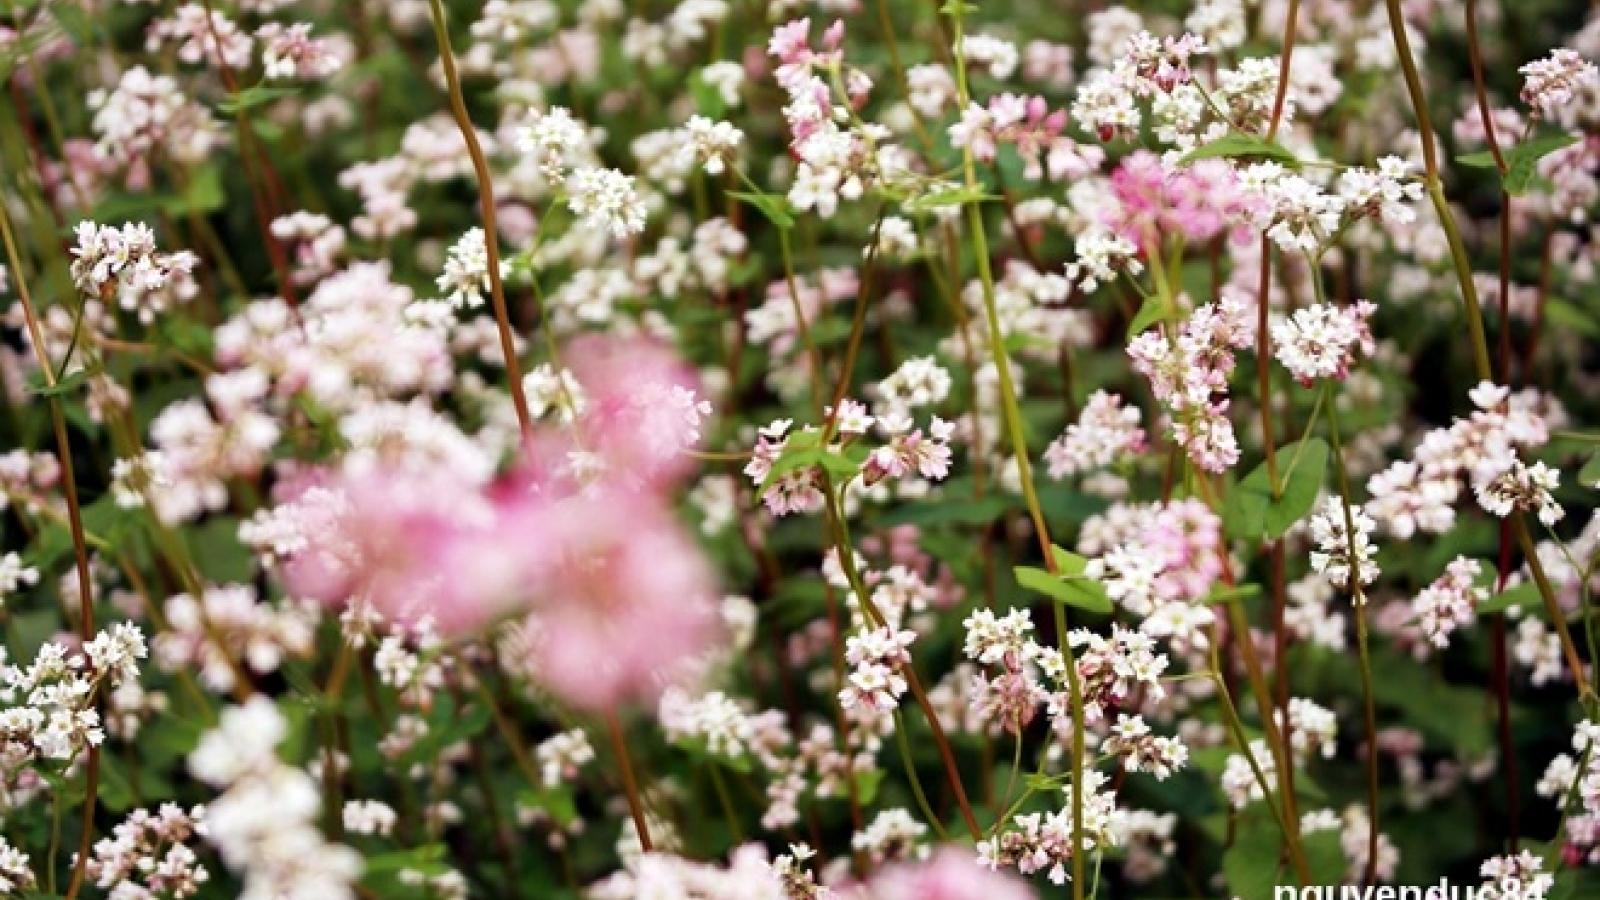 Da Lat brightened with Tam Giac Mach flowers blooming